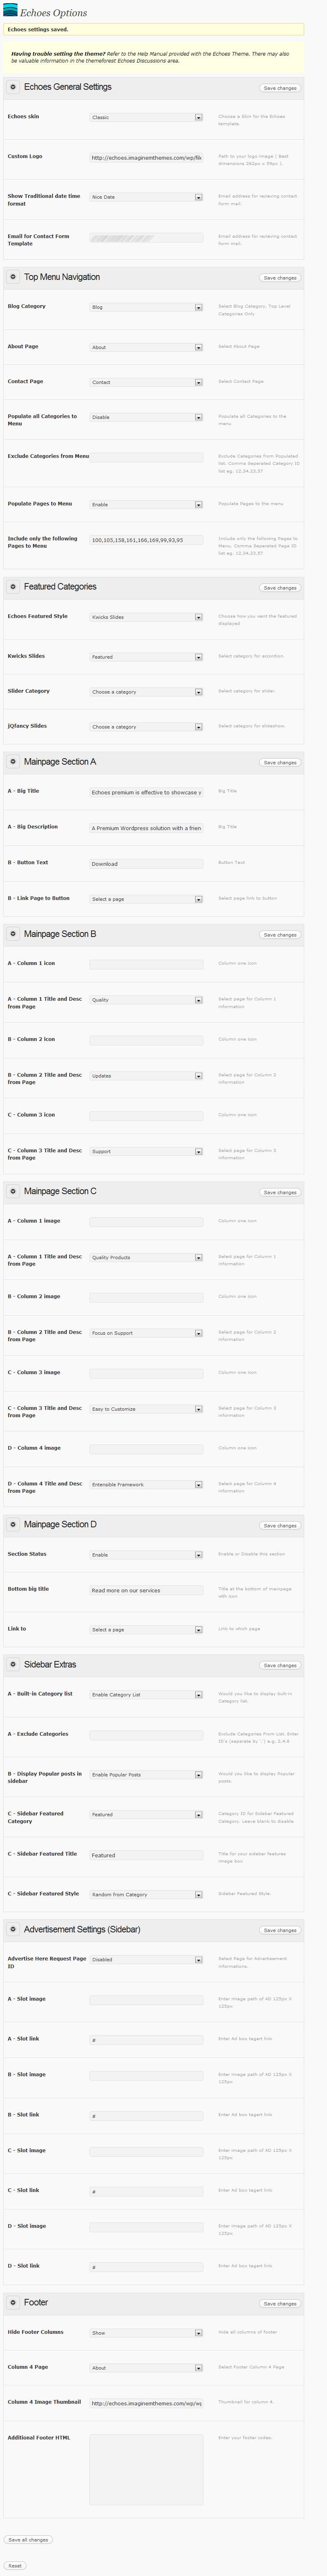 Echoes Premium Wordpress 11 in 1